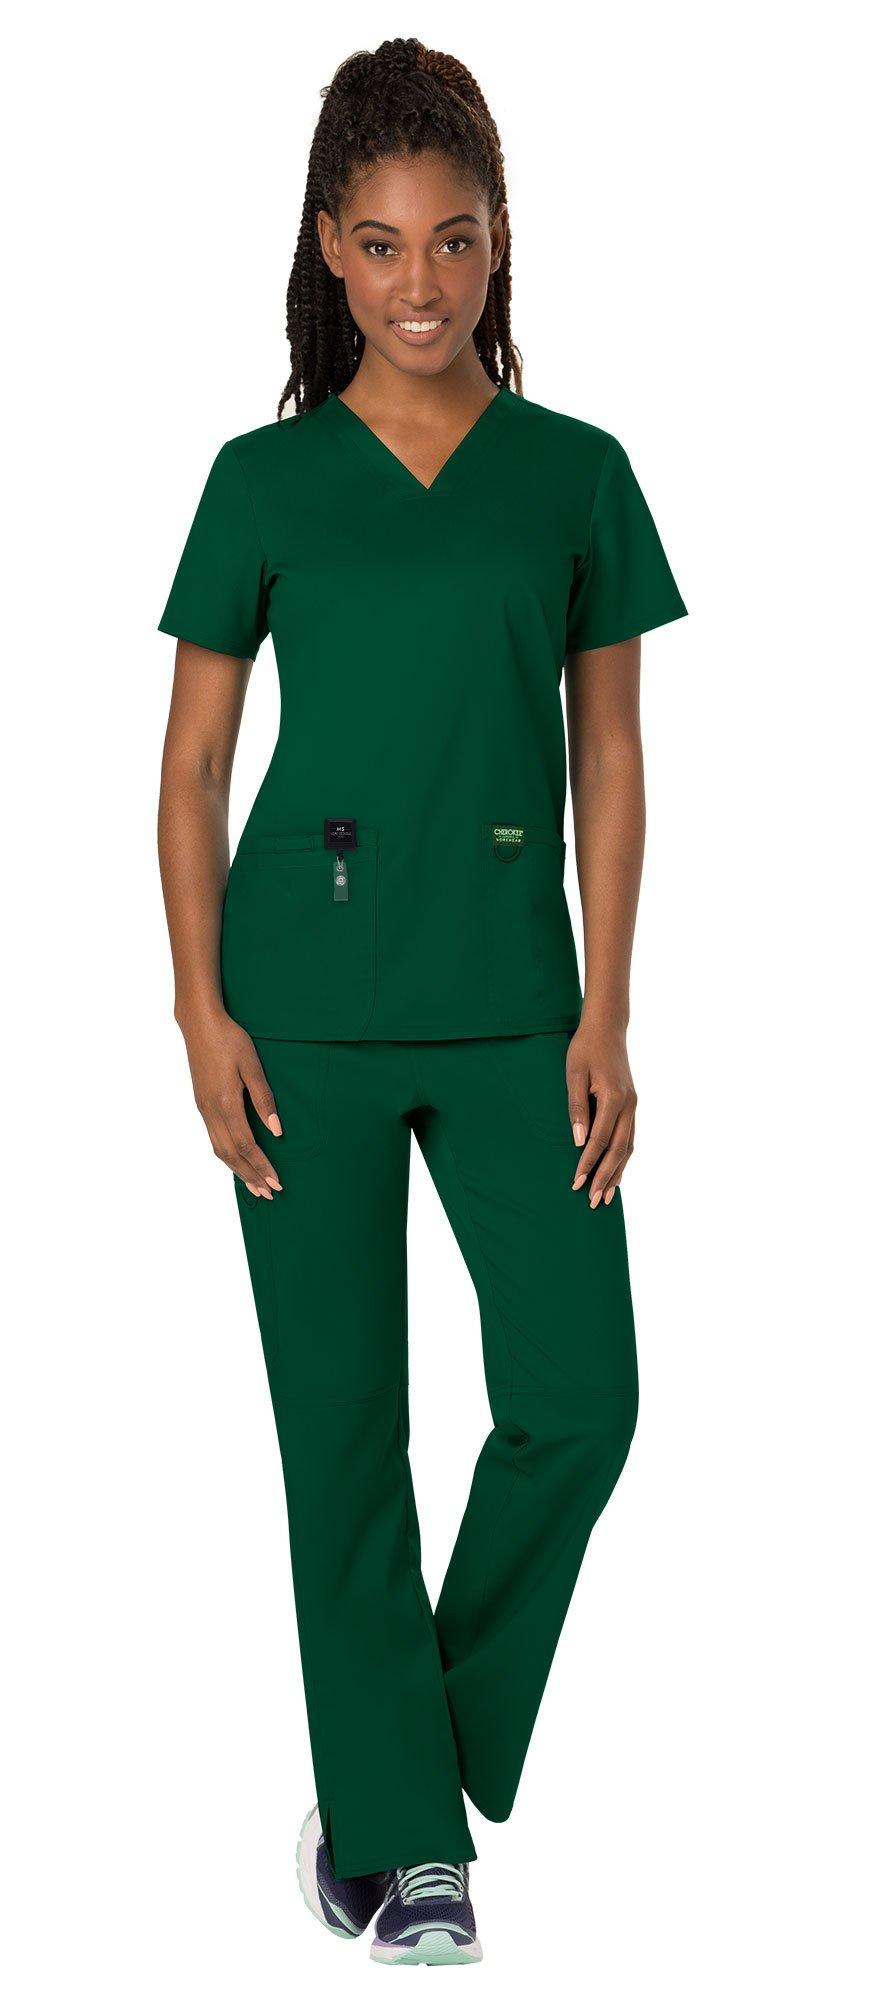 Cherokee Workwear Revolution Women's Medical Uniforms Scrubs Set Bundle - WW620 V-Neck Scrub Top & WW110 Elastic Waist Scrub Pants & MS Badge Reel (Hunter Green - XX-Large/XXL Tall)